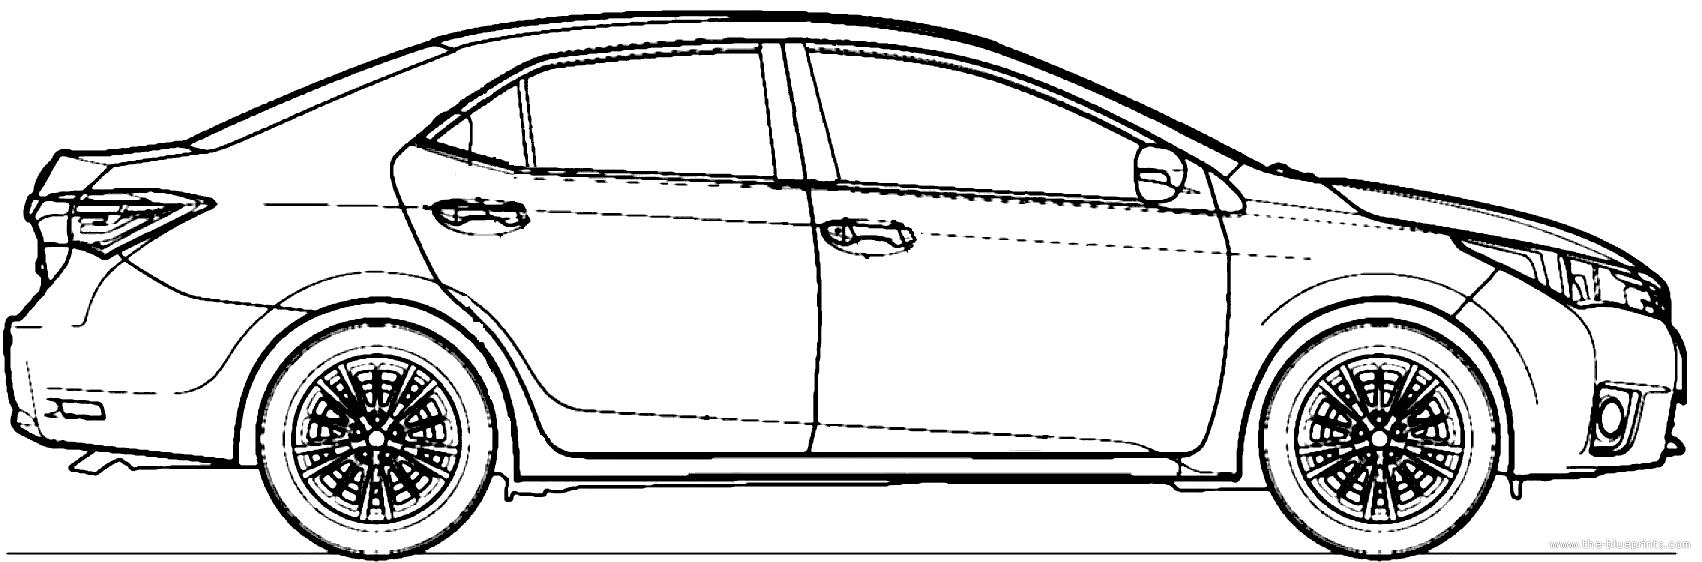 Blueprints cars toyota toyota corolla 2014 toyota corolla 2014 malvernweather Gallery